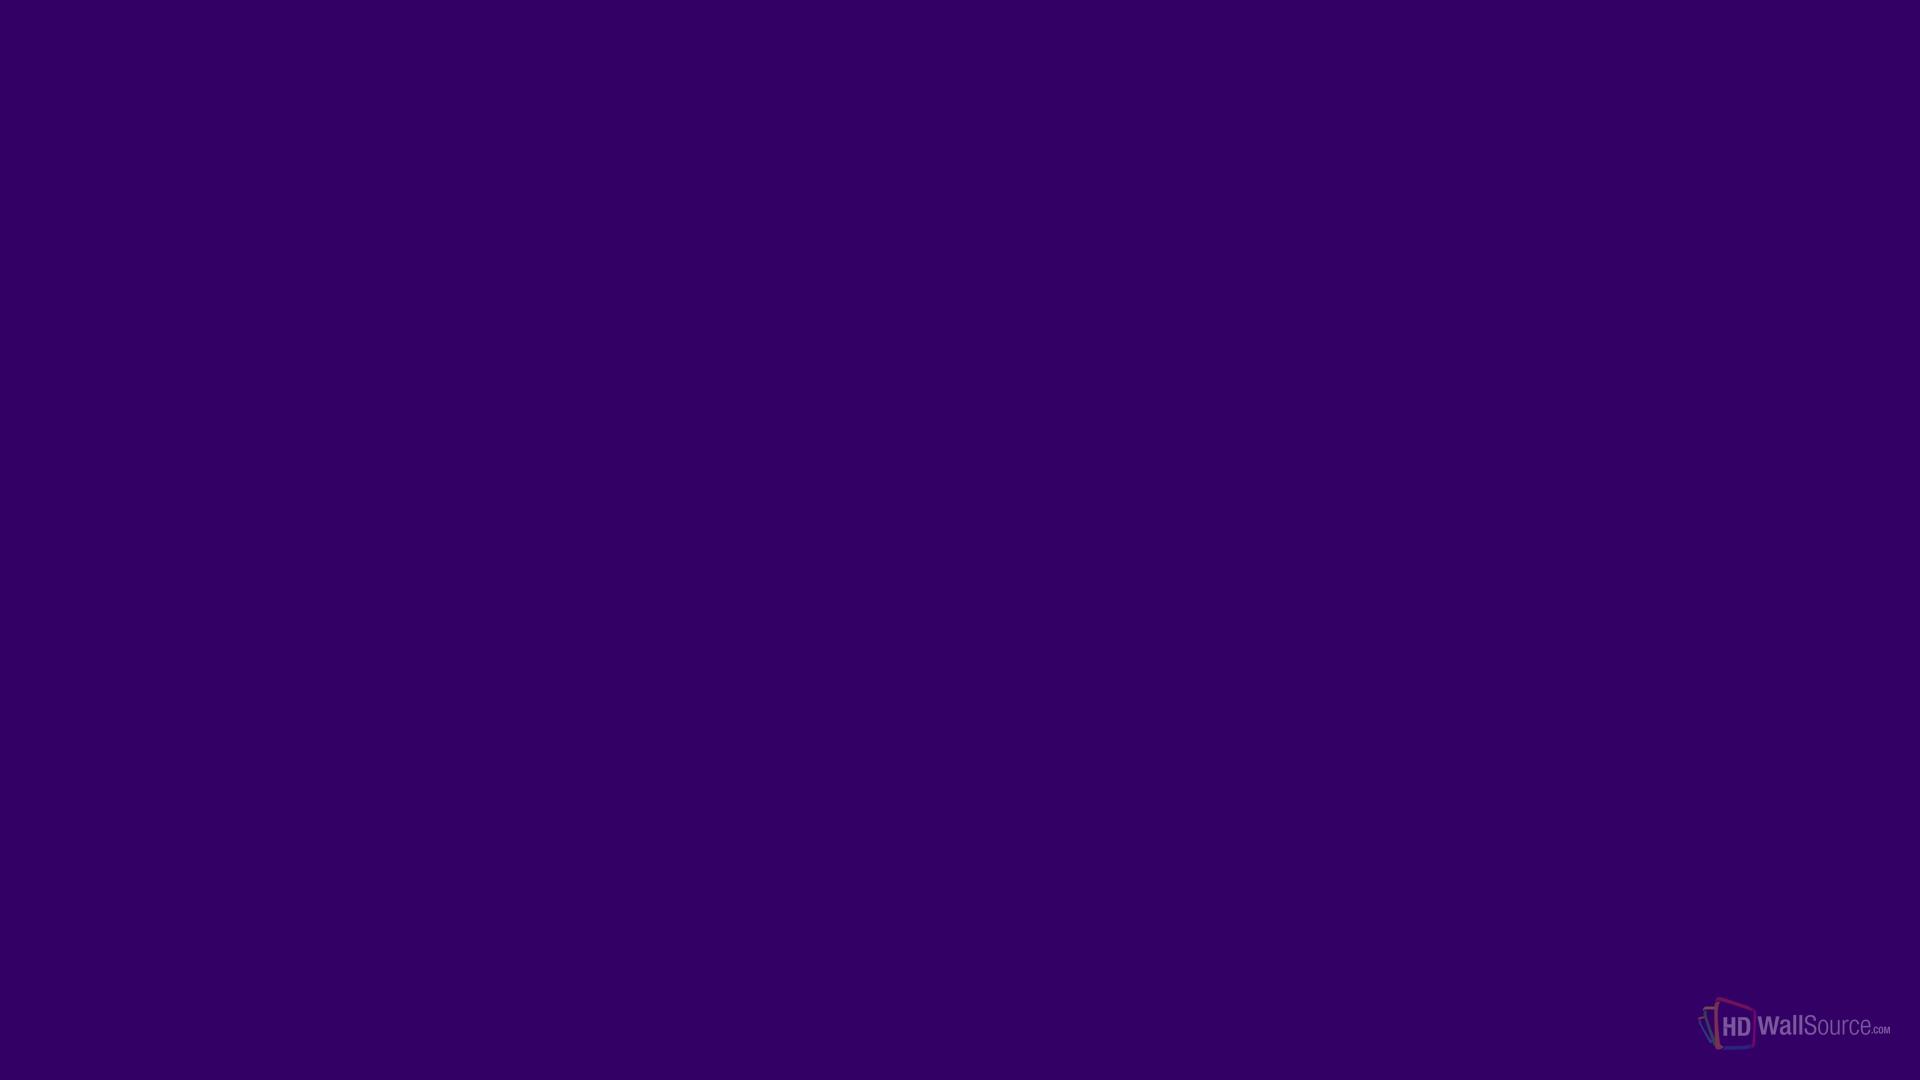 330066 wallpaper 71163